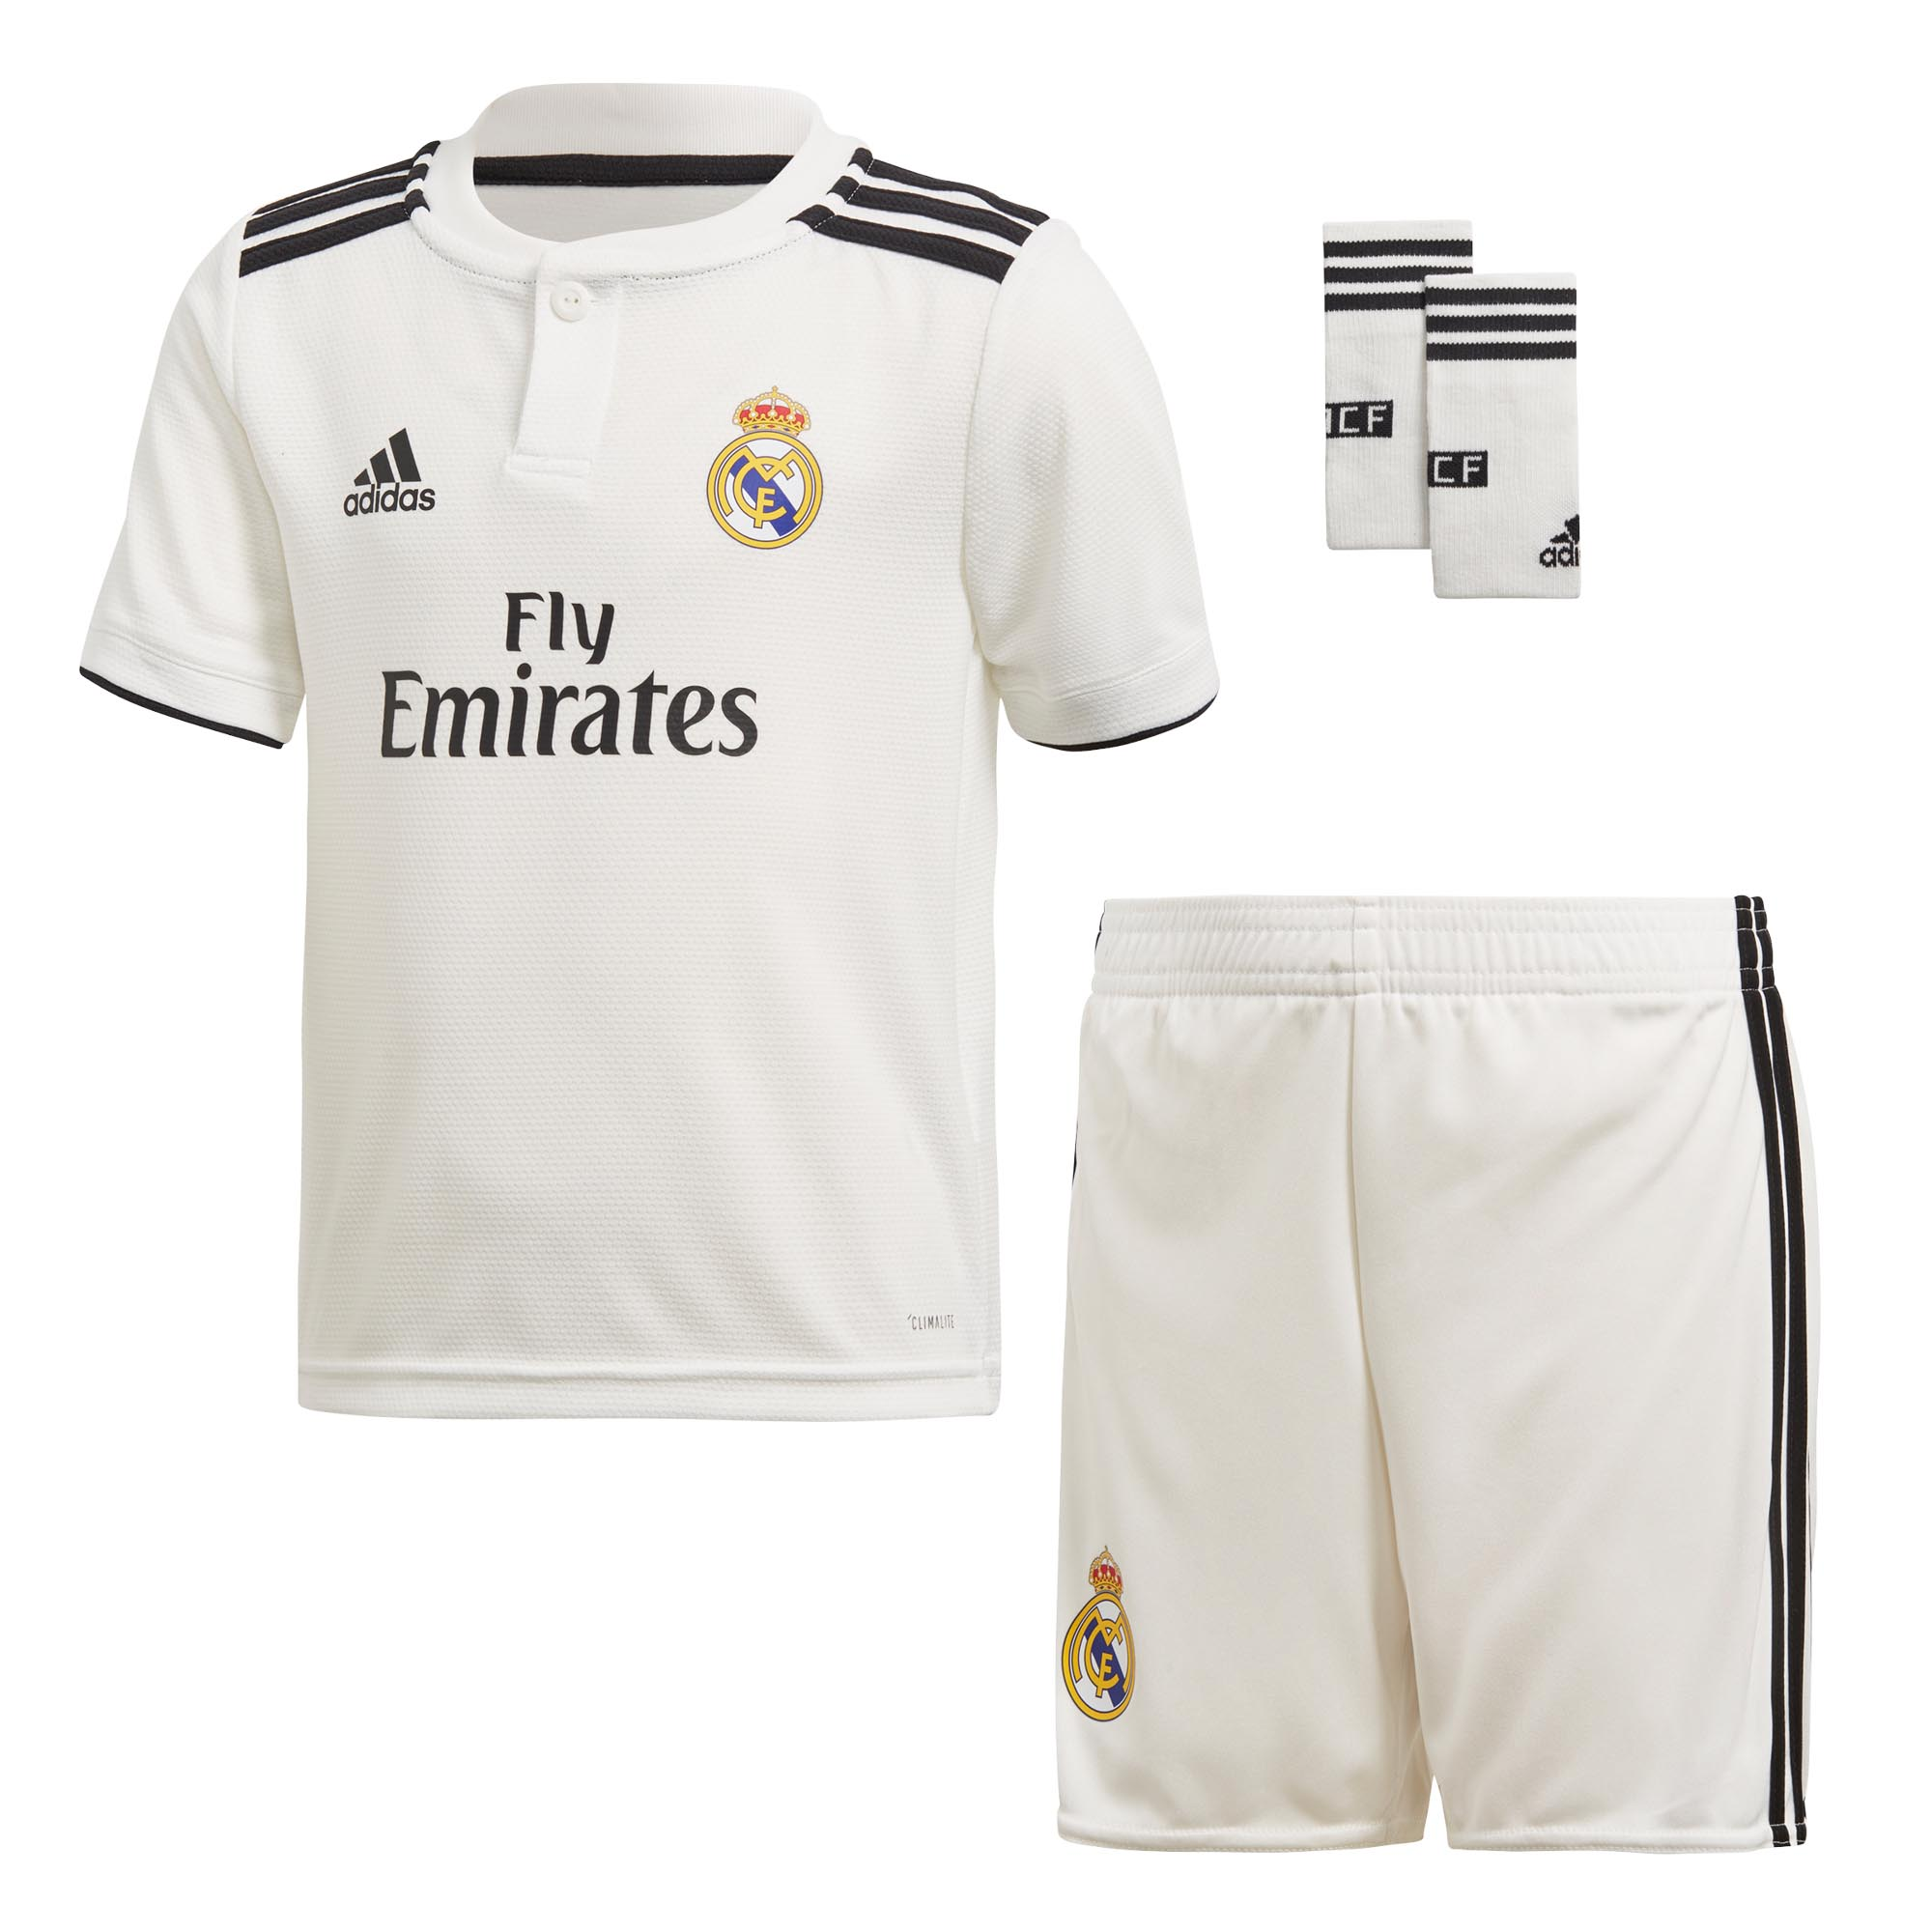 099e8875dc4 Details about adidas Real Madrid 2018 19 Kids Mini Home Football Soccer Kit  Set White